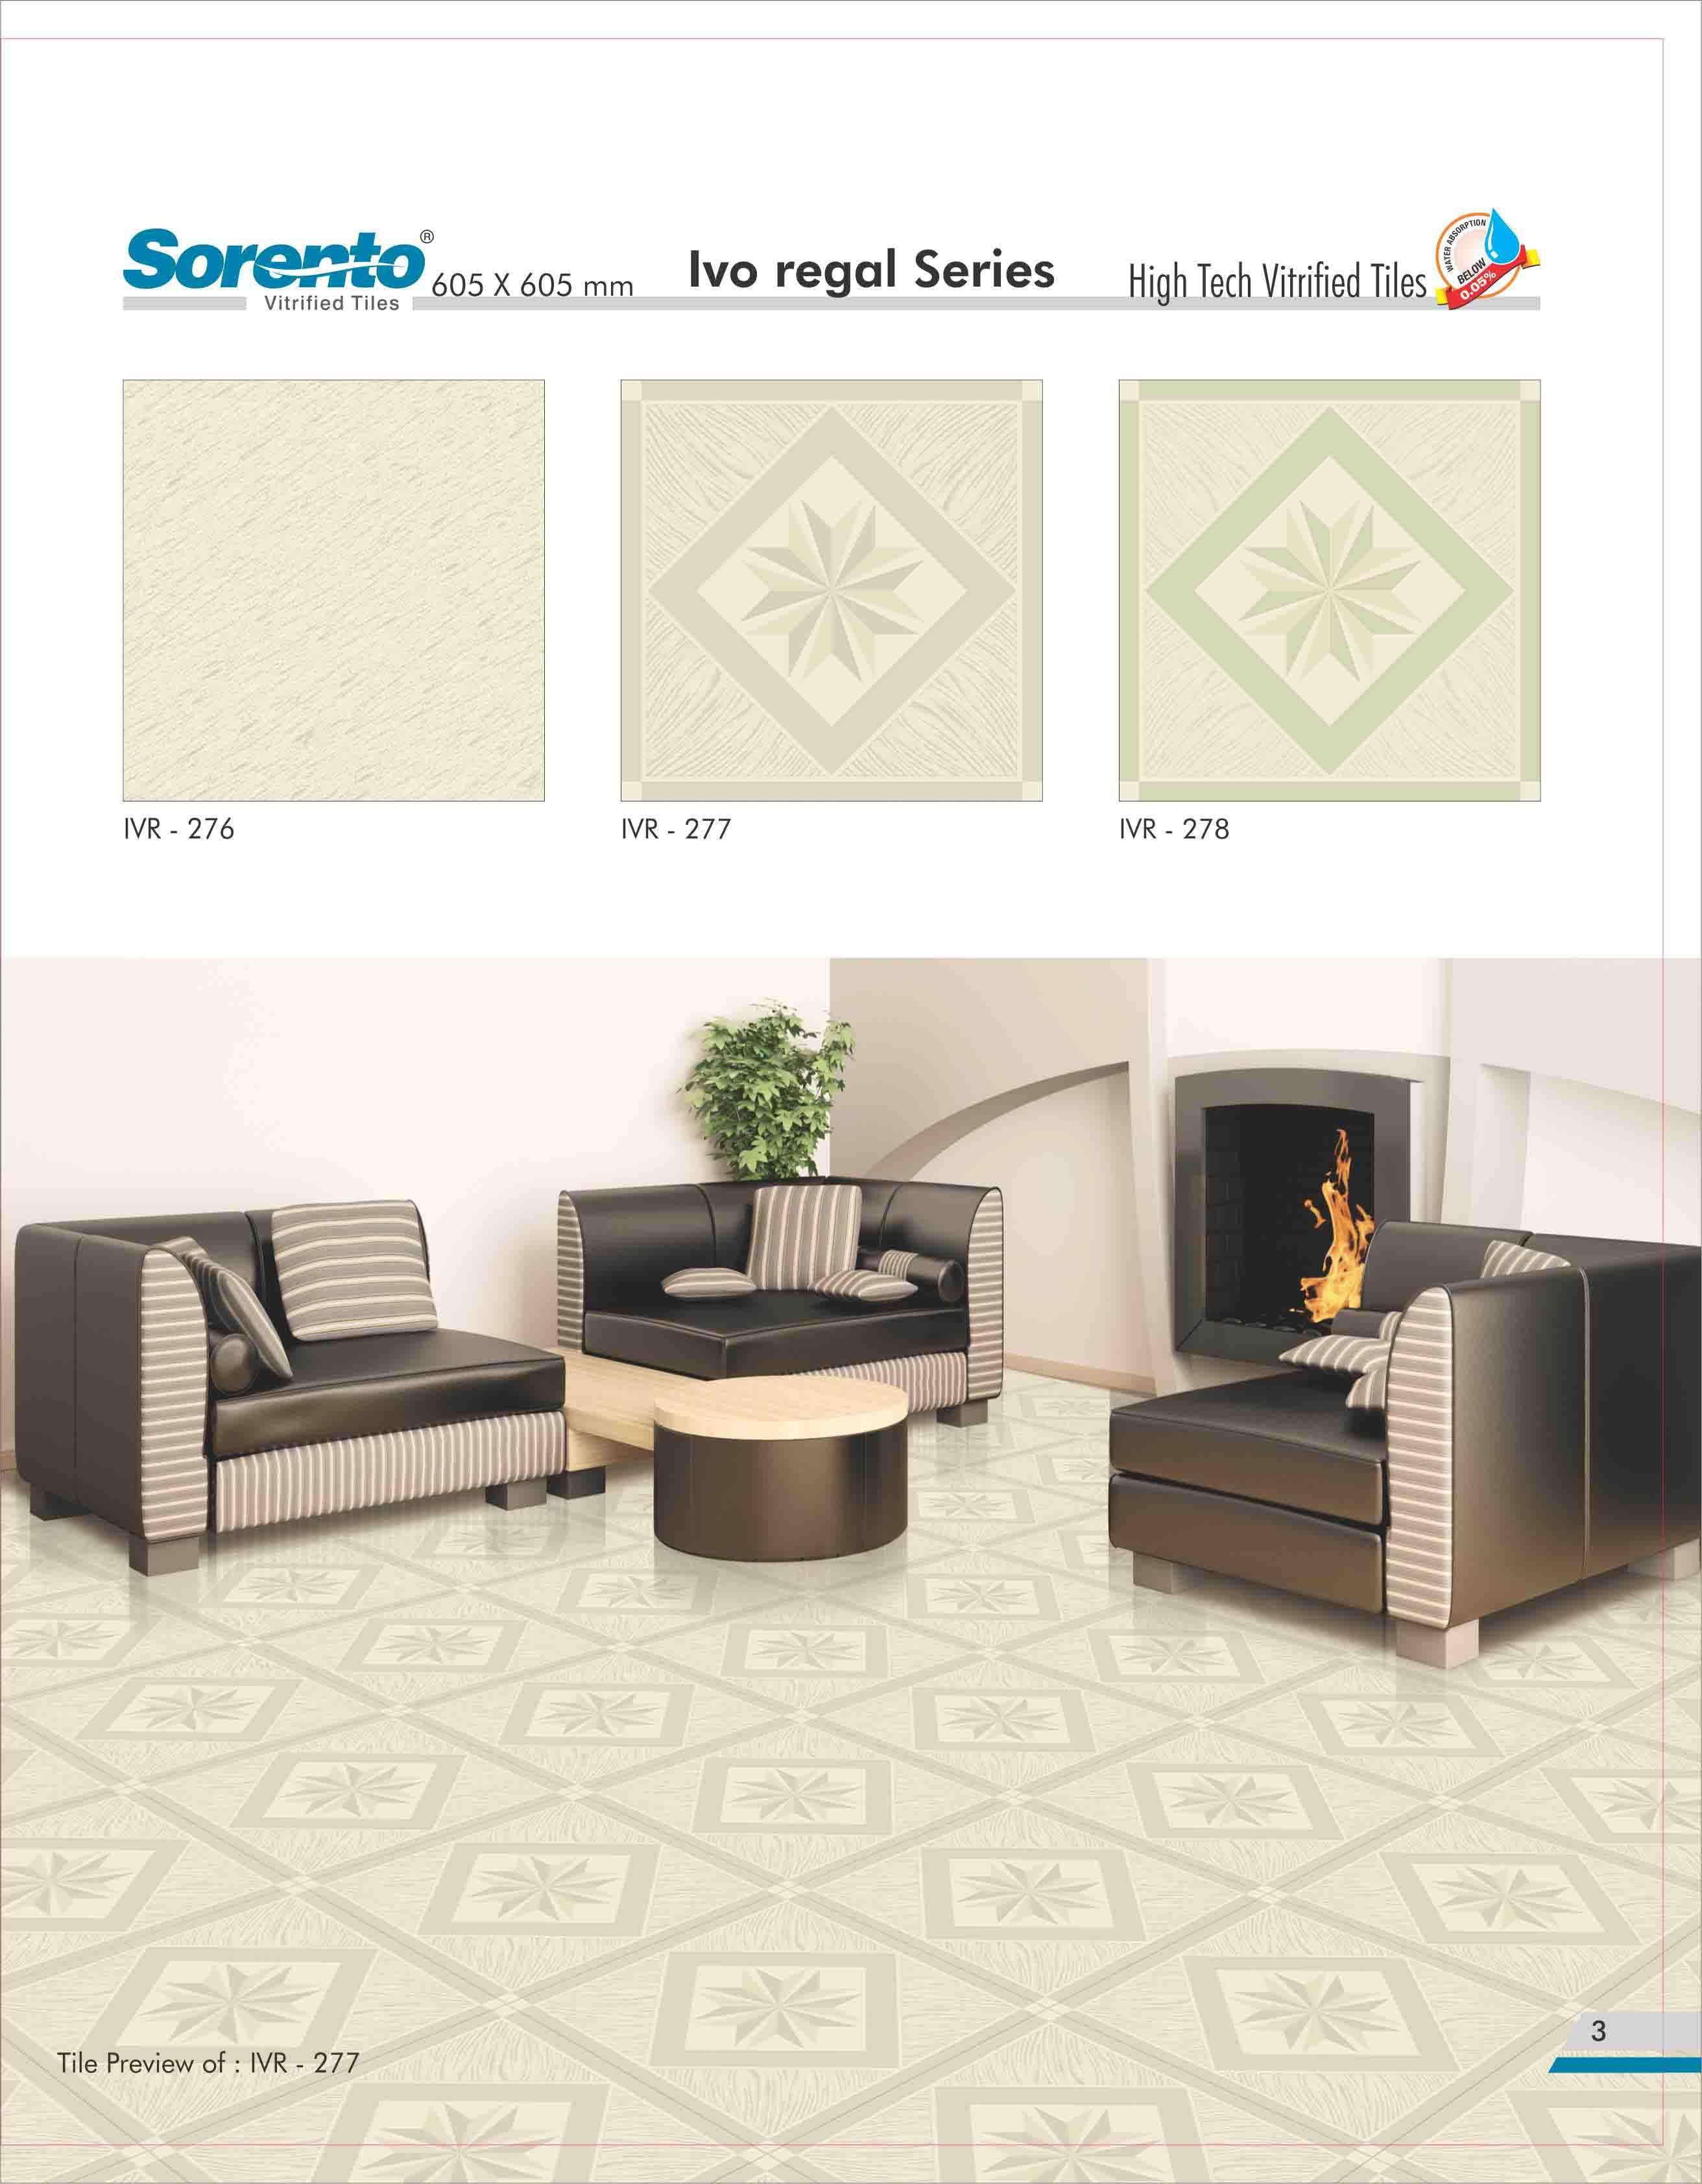 Pin by ceramic directory on sorento granito pvt ltd pinterest vitrified tiles tile manufacturers tile design glazed tiles dailygadgetfo Gallery